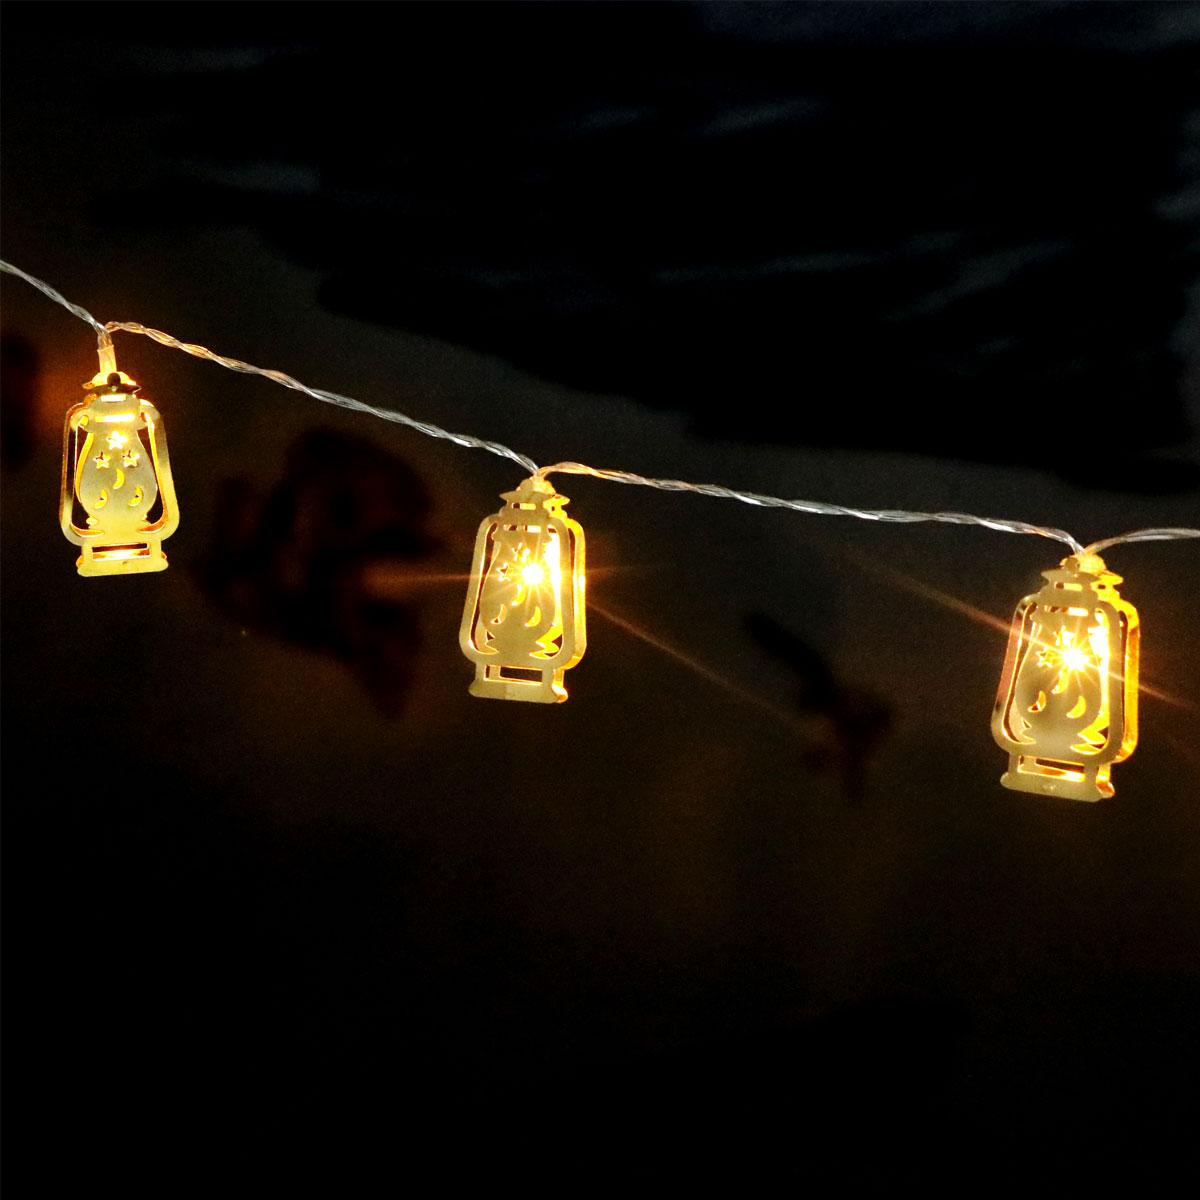 Lights & Lighting Just Smuxi 10led String Light Lamp Islamic Eid Ramadan Mubarak Hilal Crescent Decor Lantern Bright In Colour